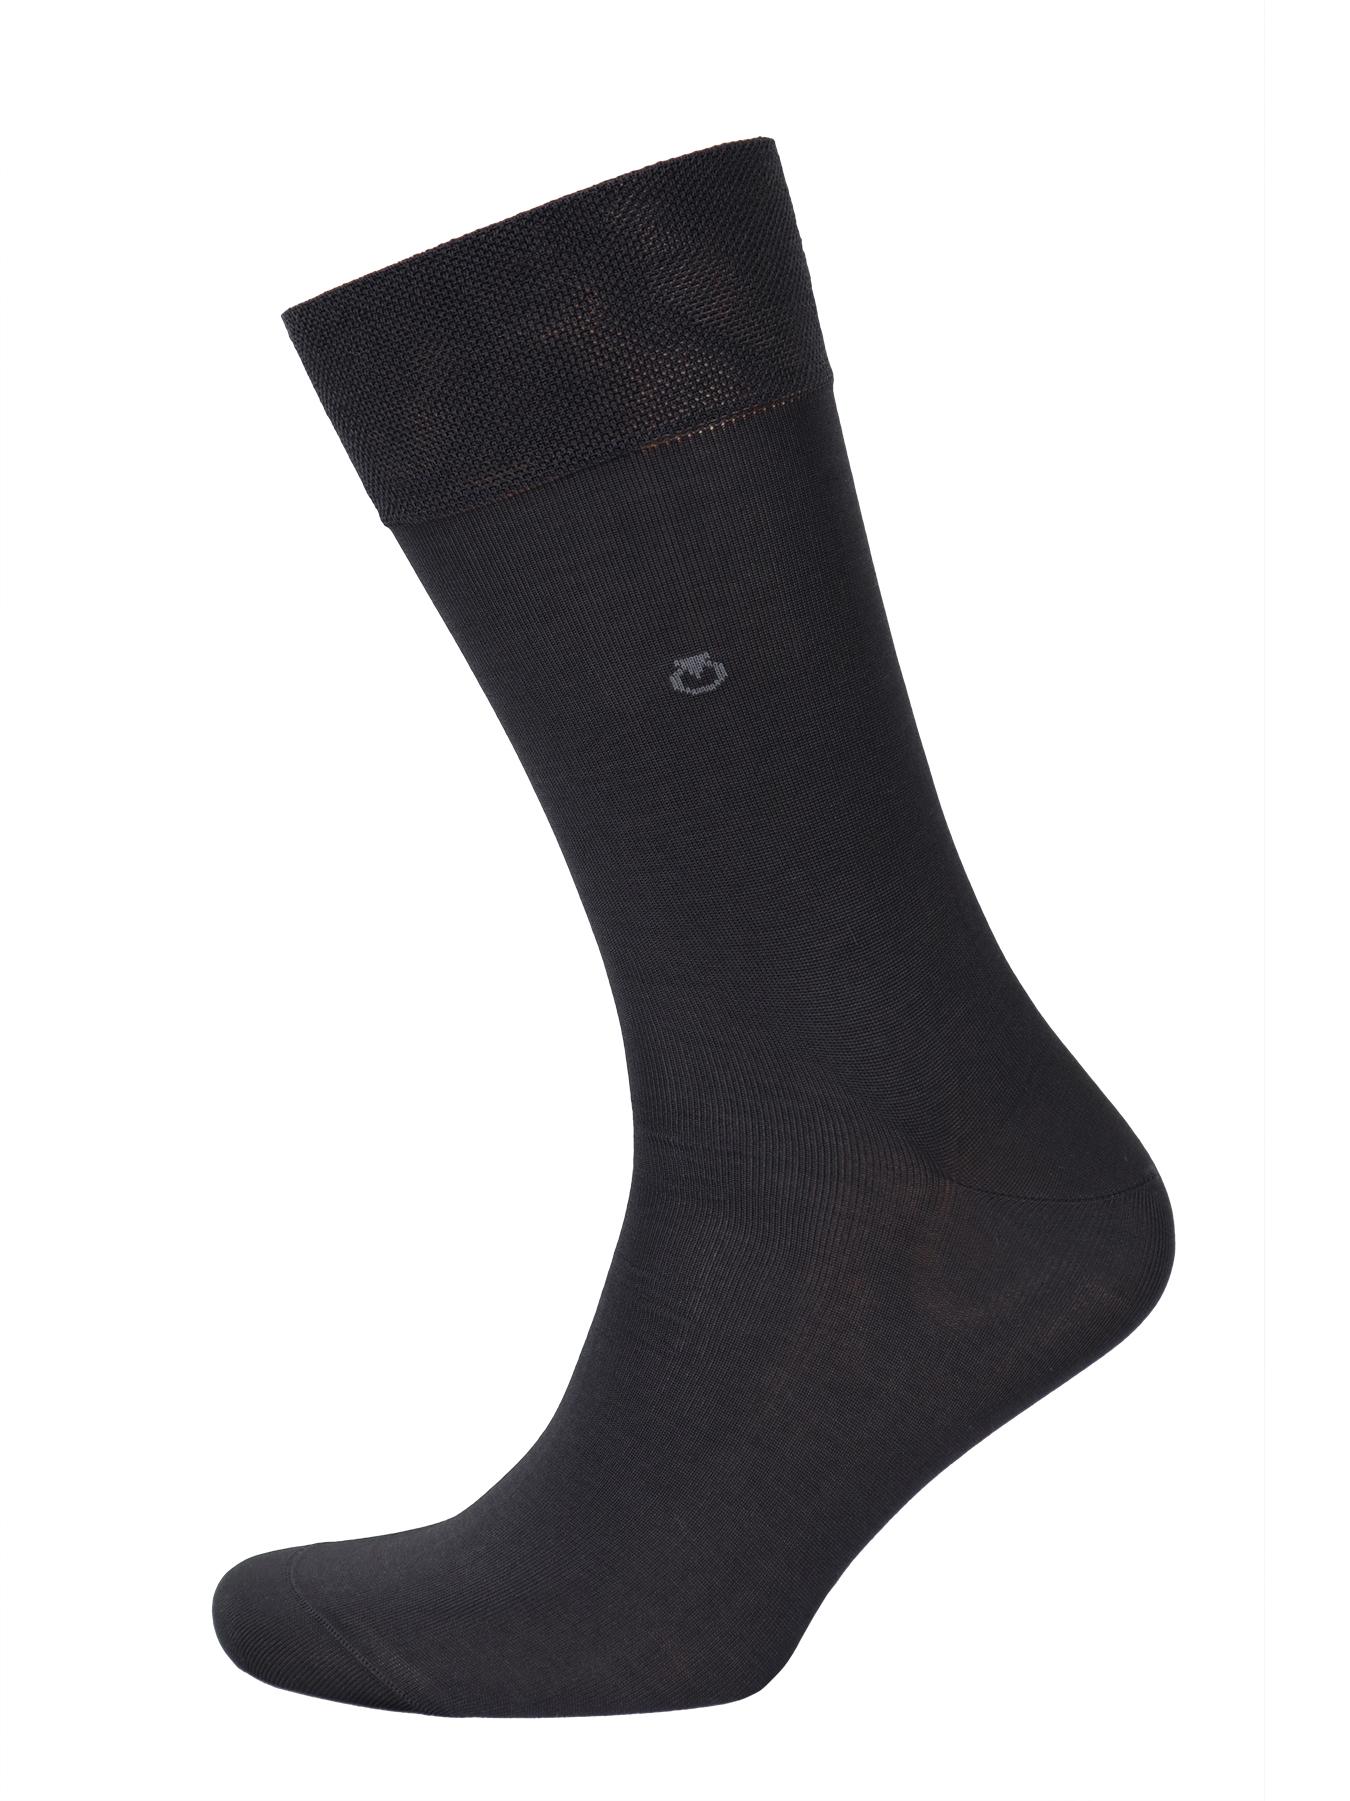 Мужские носки Opium Premium темно-серый